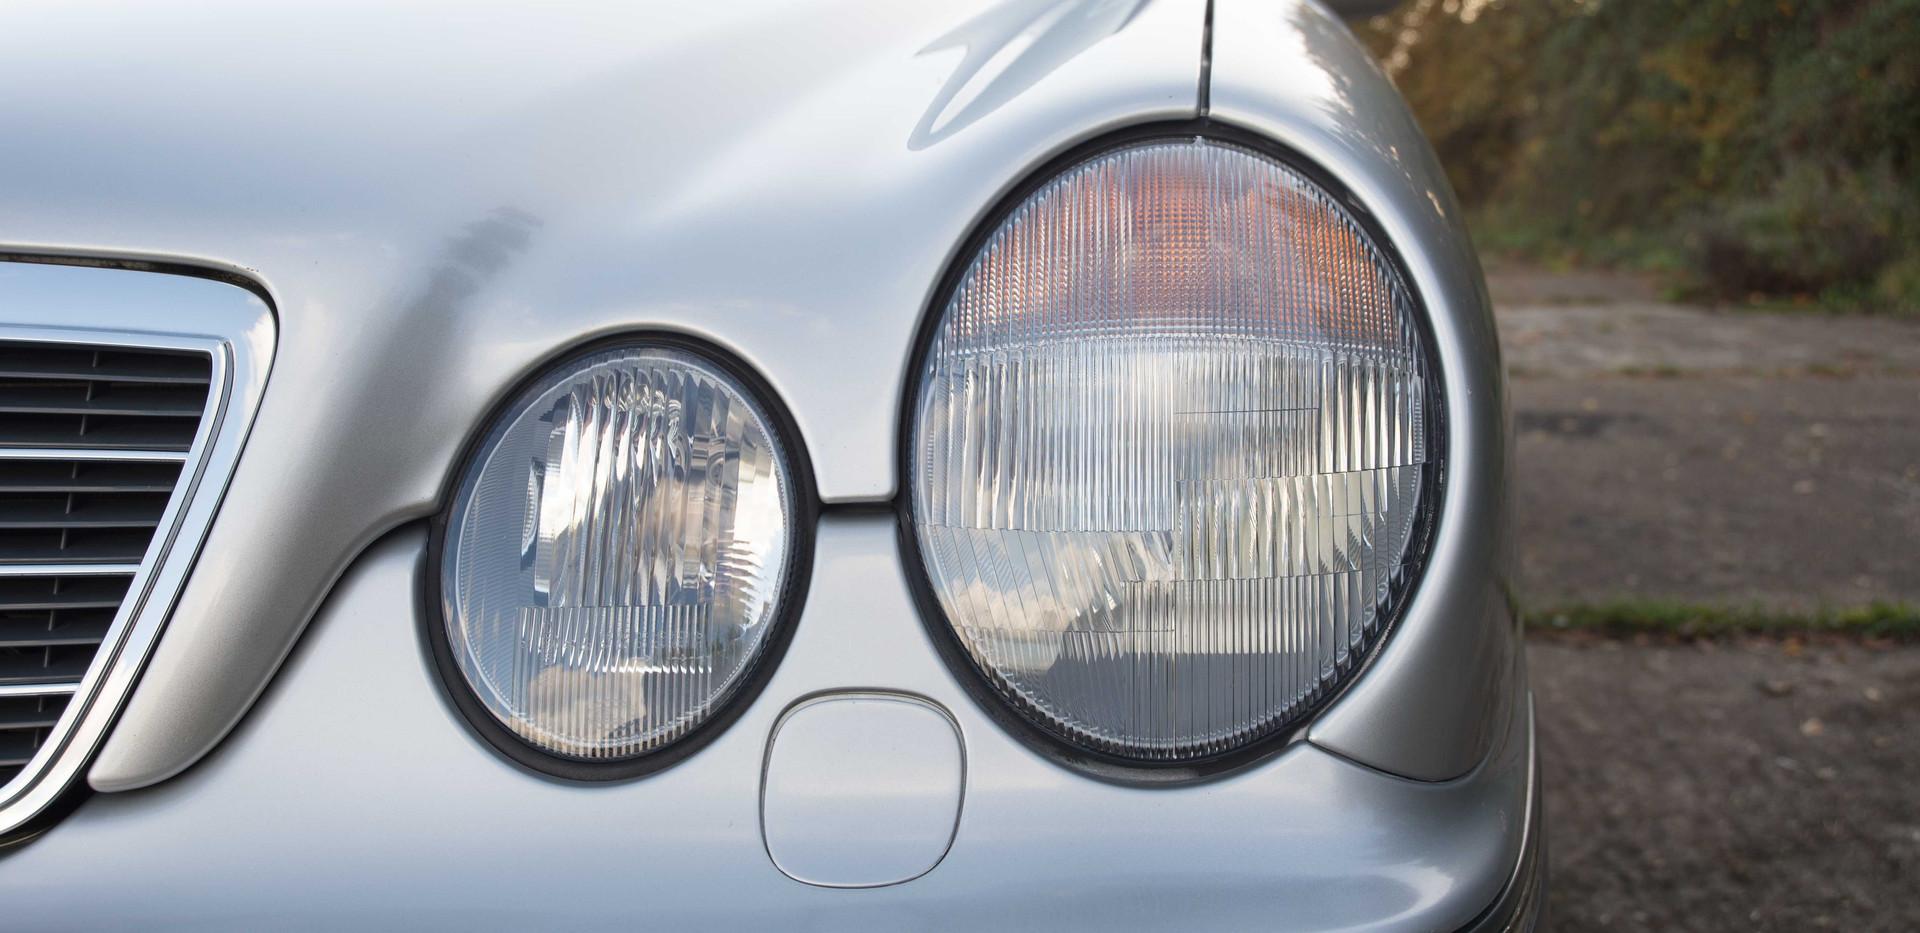 Mercedes E240 For Sale UK London  (75 of